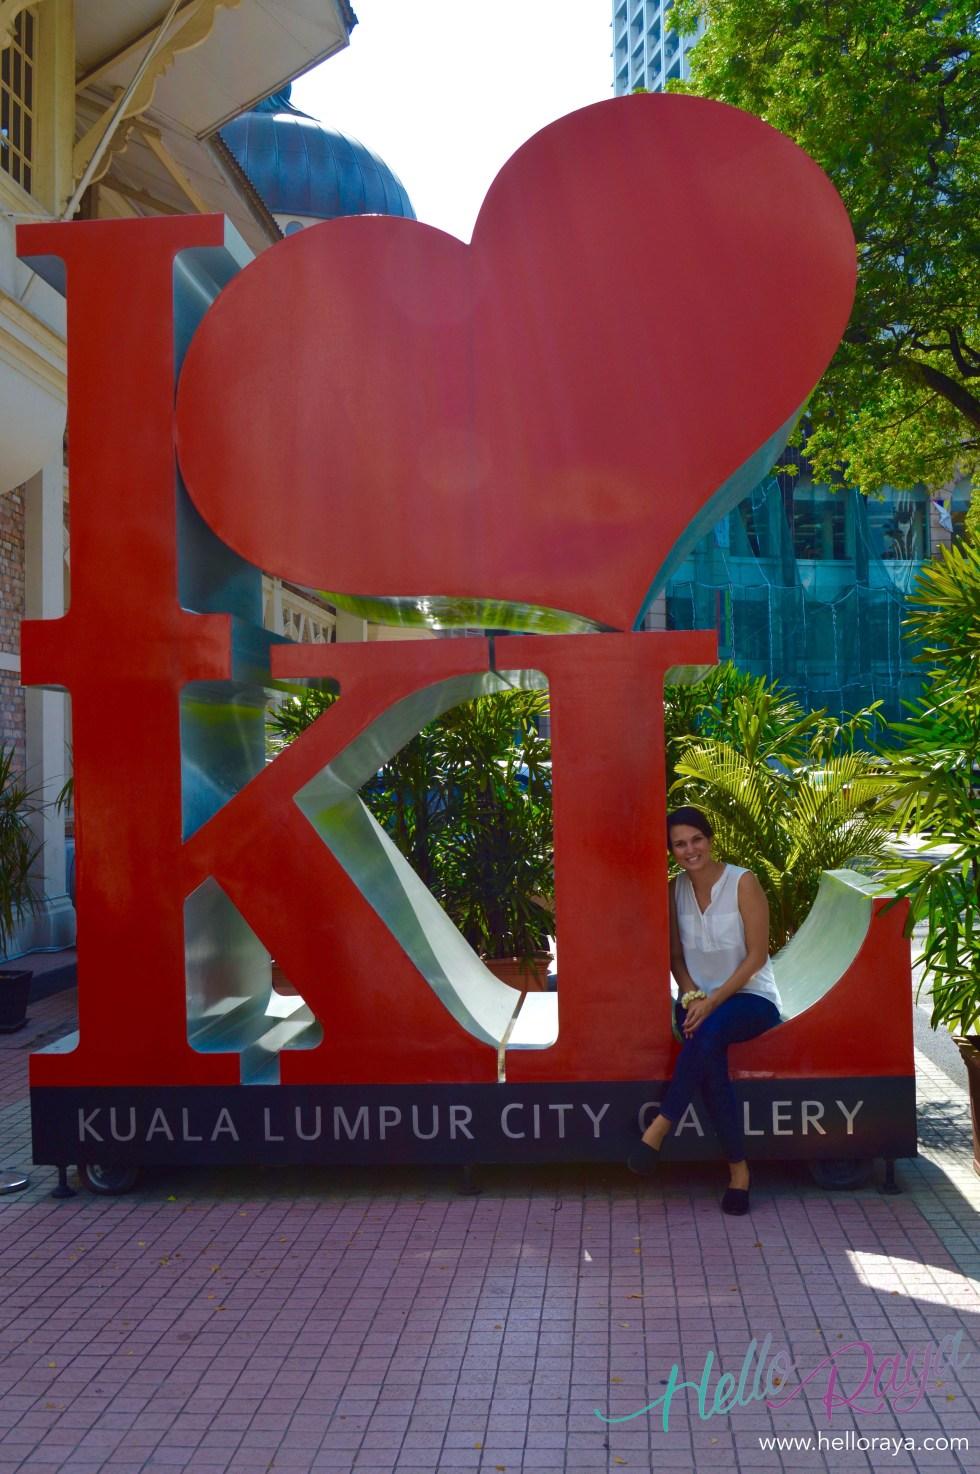 I Heart KL | Free Things to do in Kuala Lumpur | Hello Raya Blog